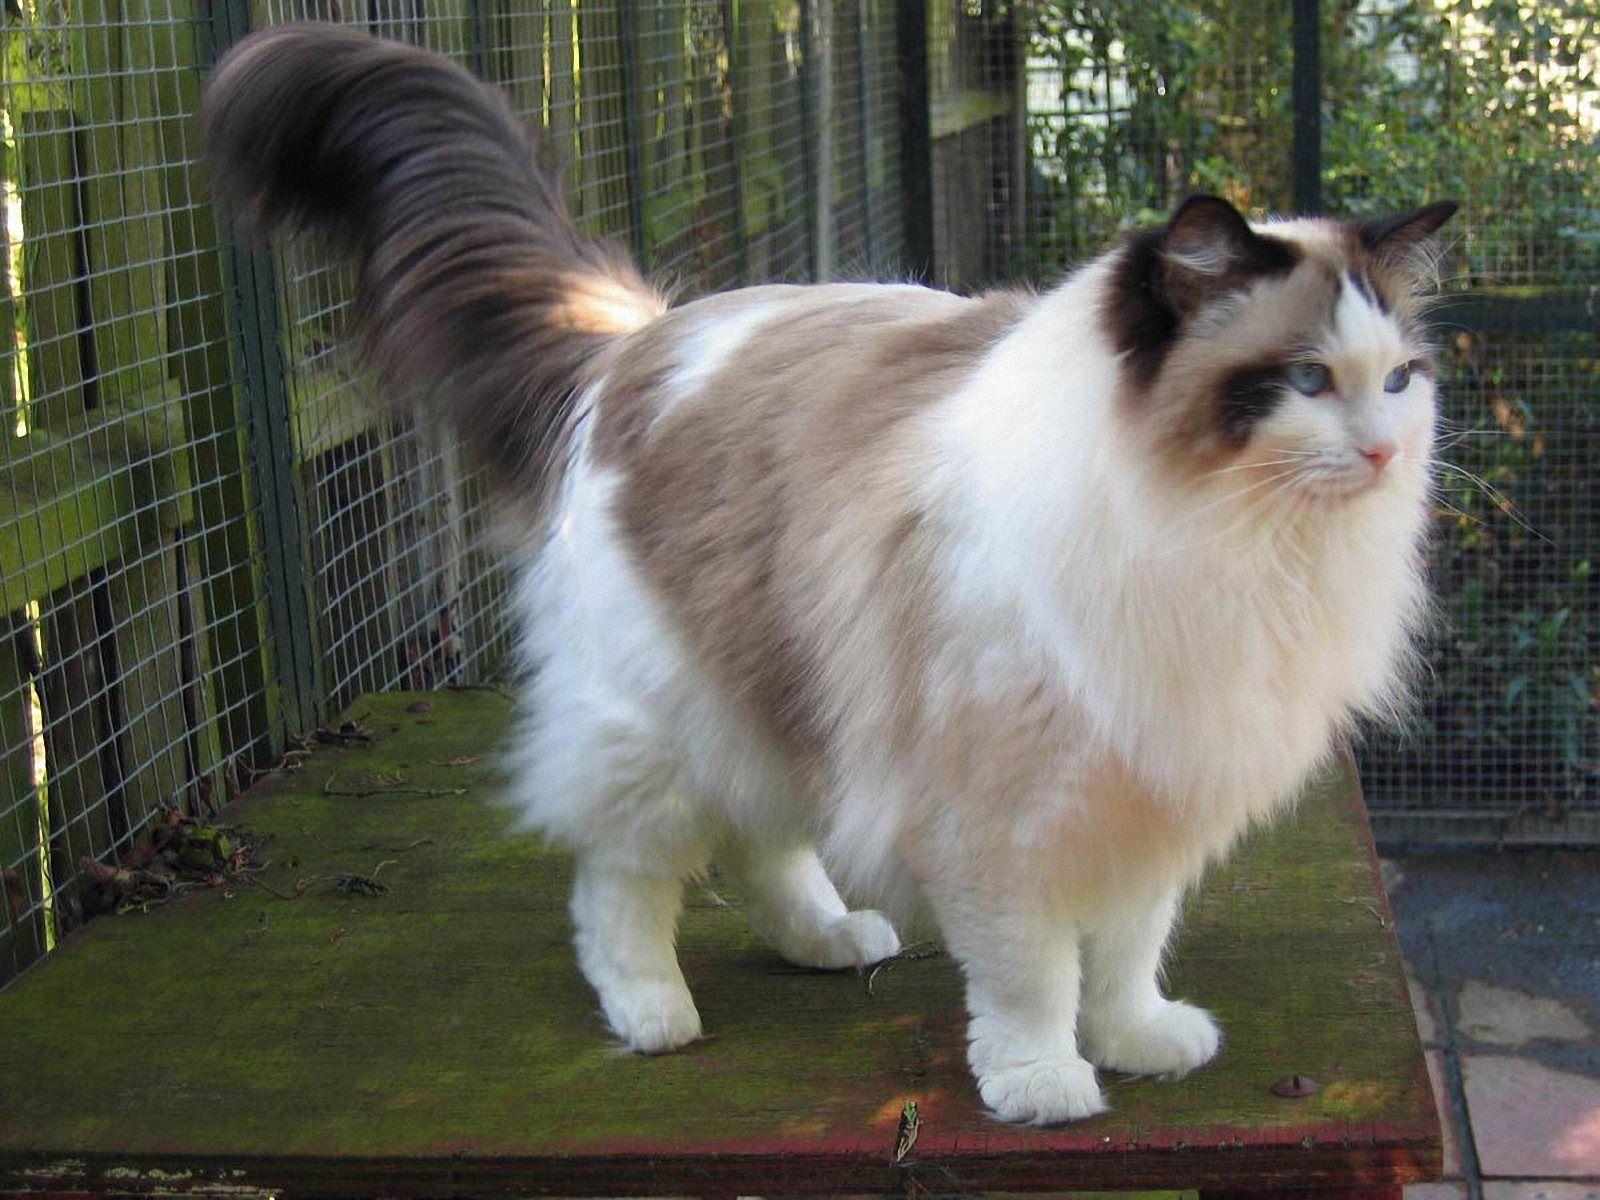 Penyakit Kulit Kucing Persiamacam Macam Jenis Kucing Persia